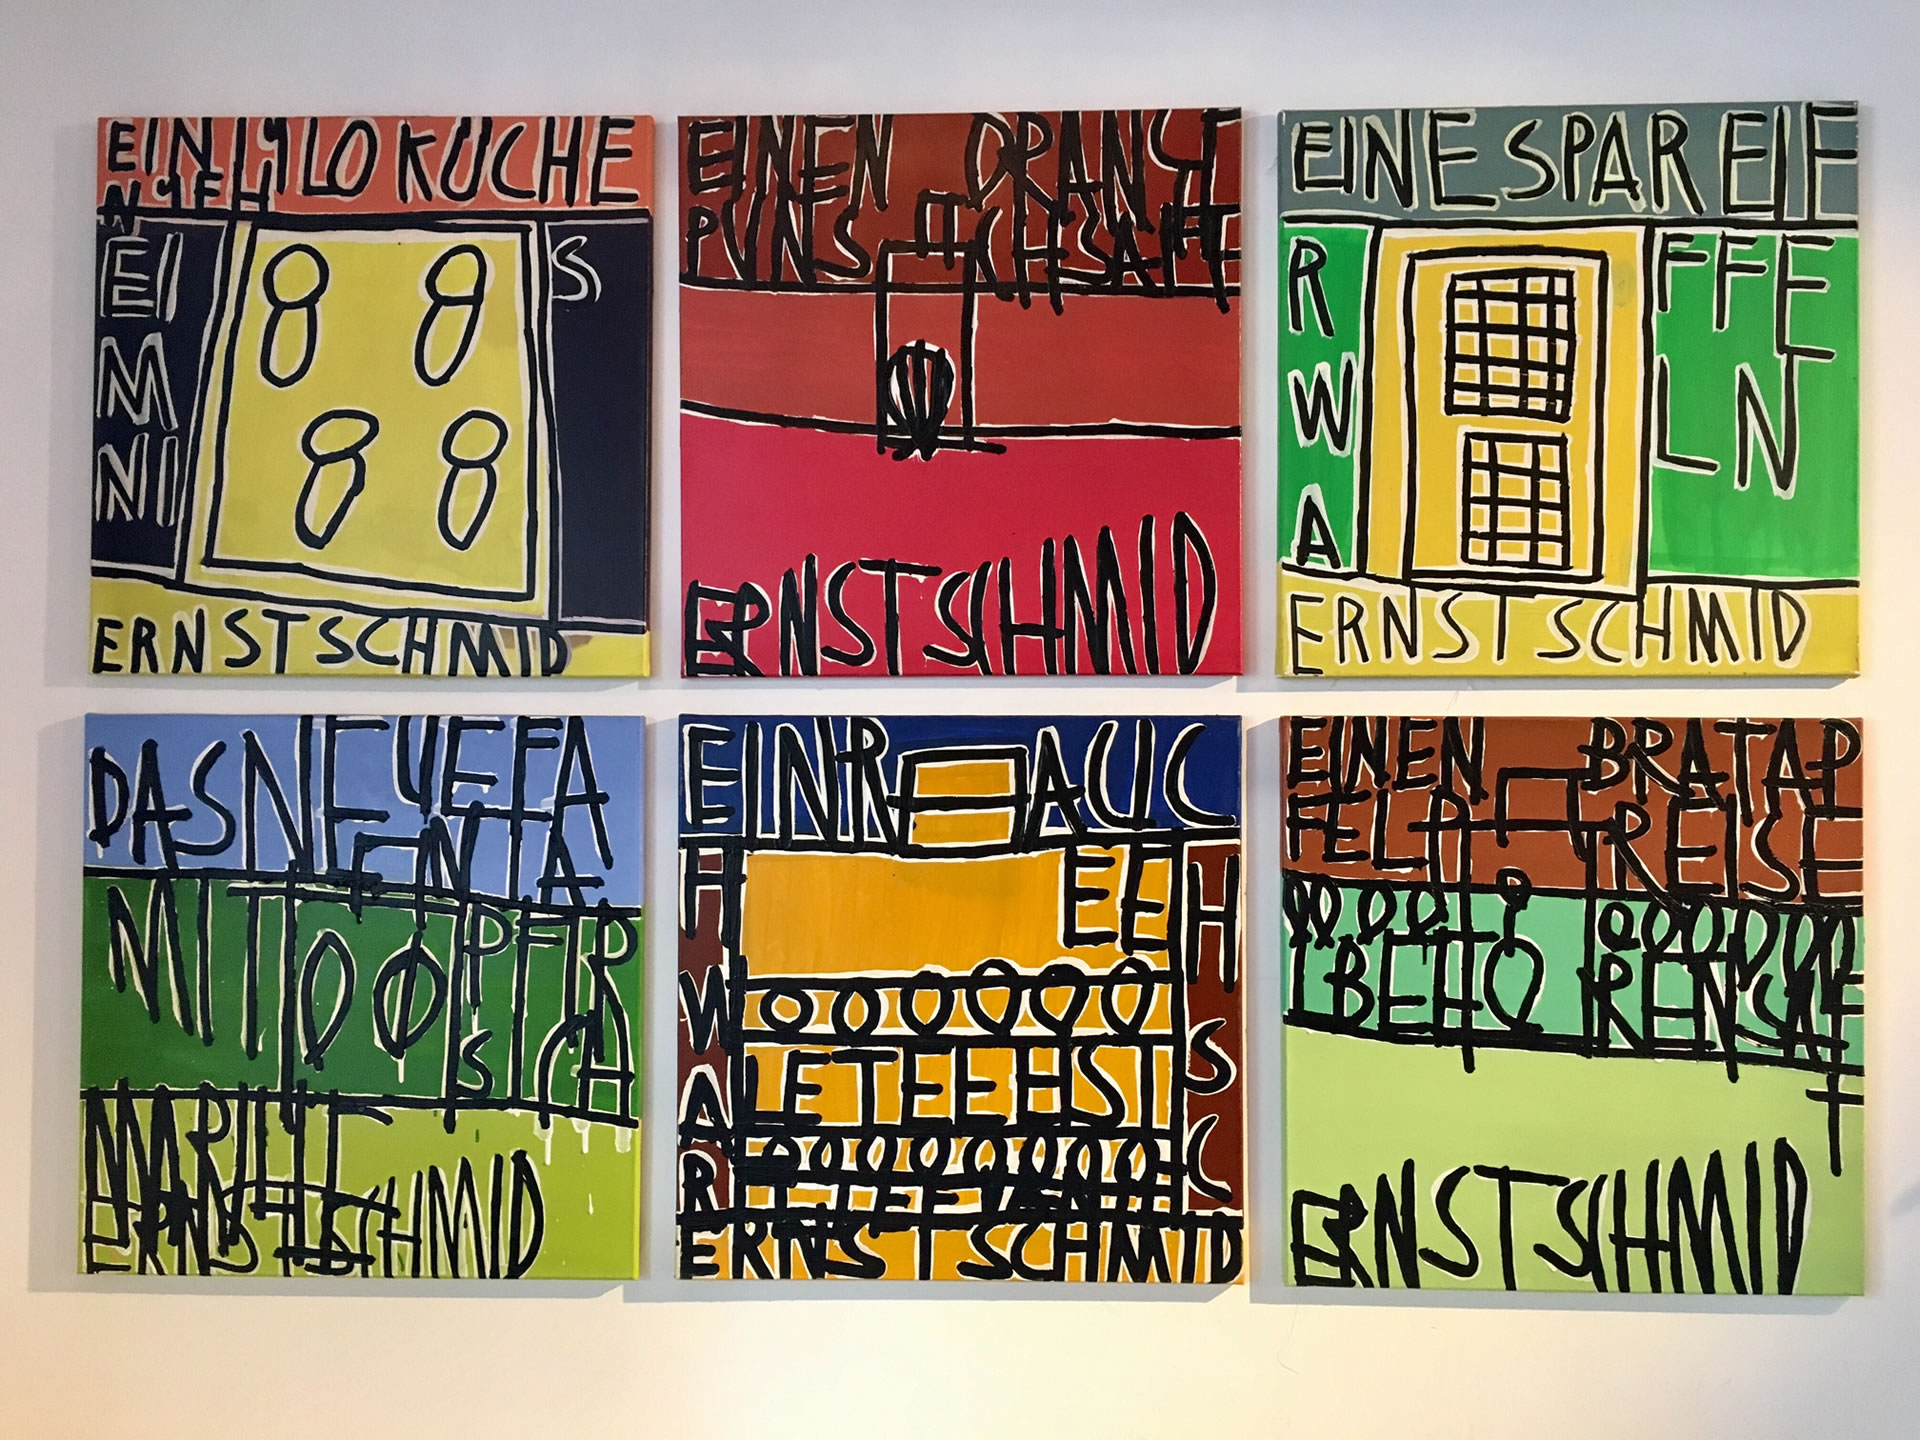 Galerie3 | Kopfkino | 22 | Ernst Schmid | Magdas Lokal